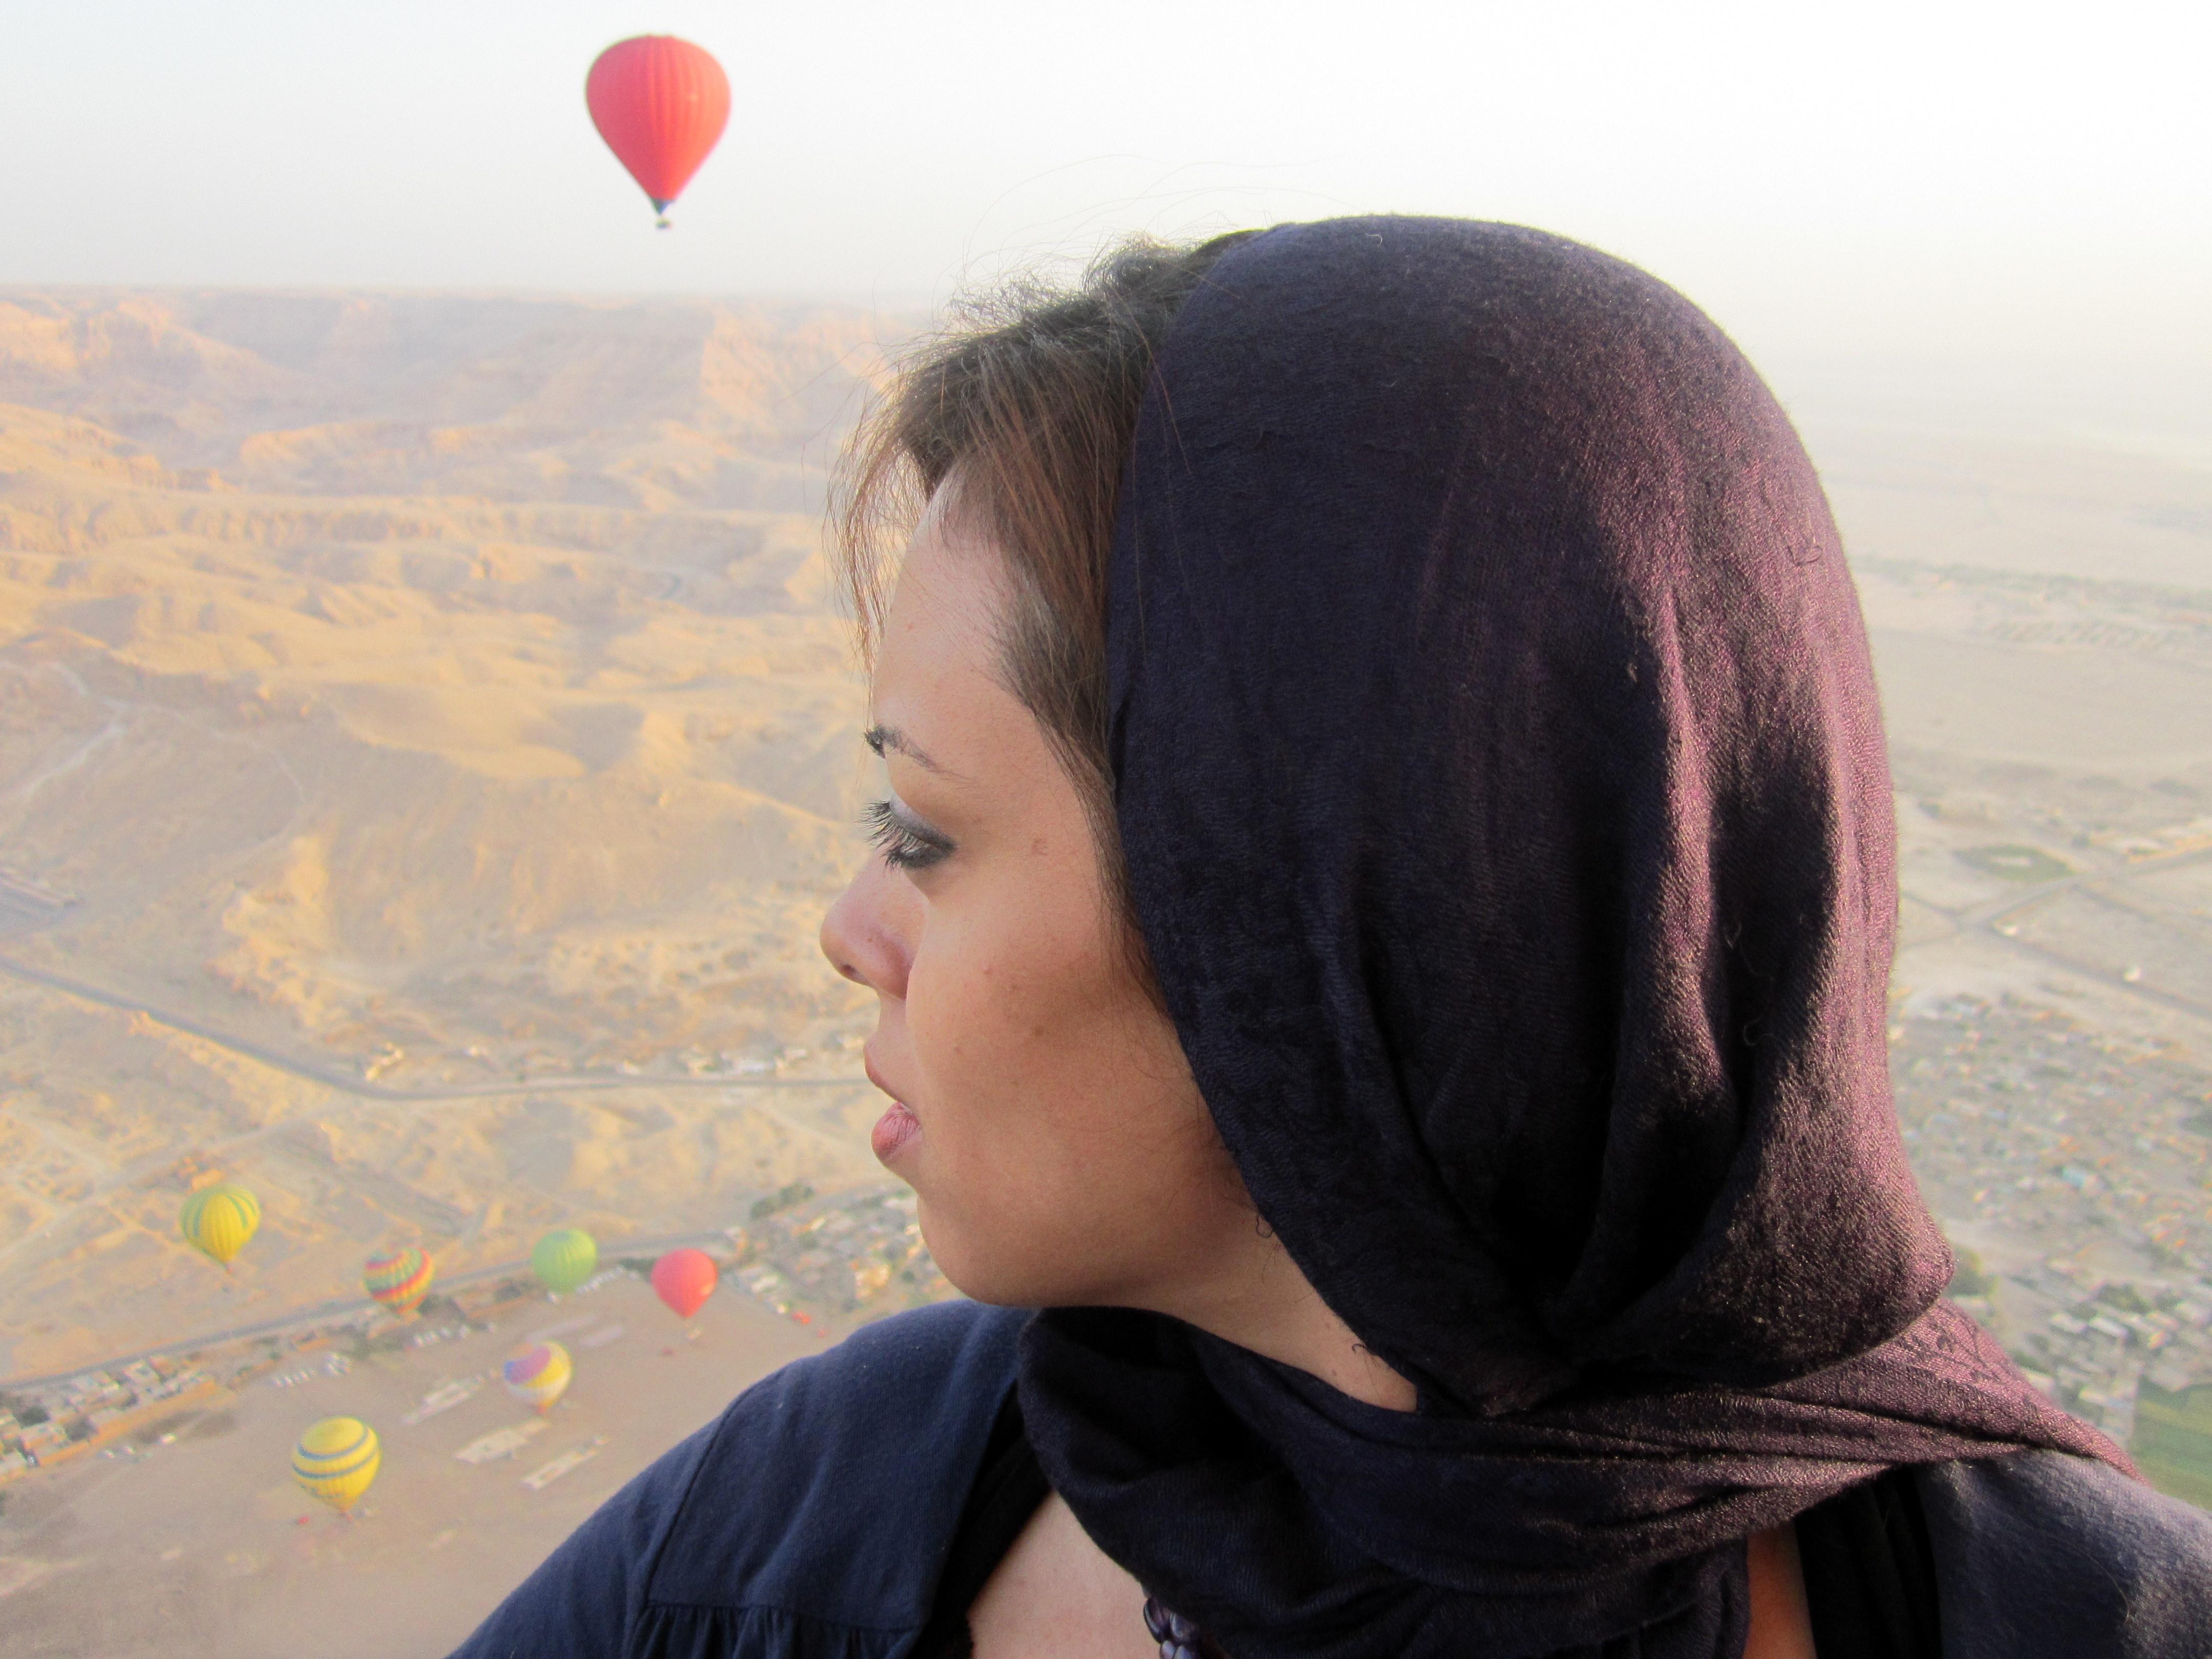 #egypt #egypttourism#Luxortourism #luxor #luxorhotairballooning